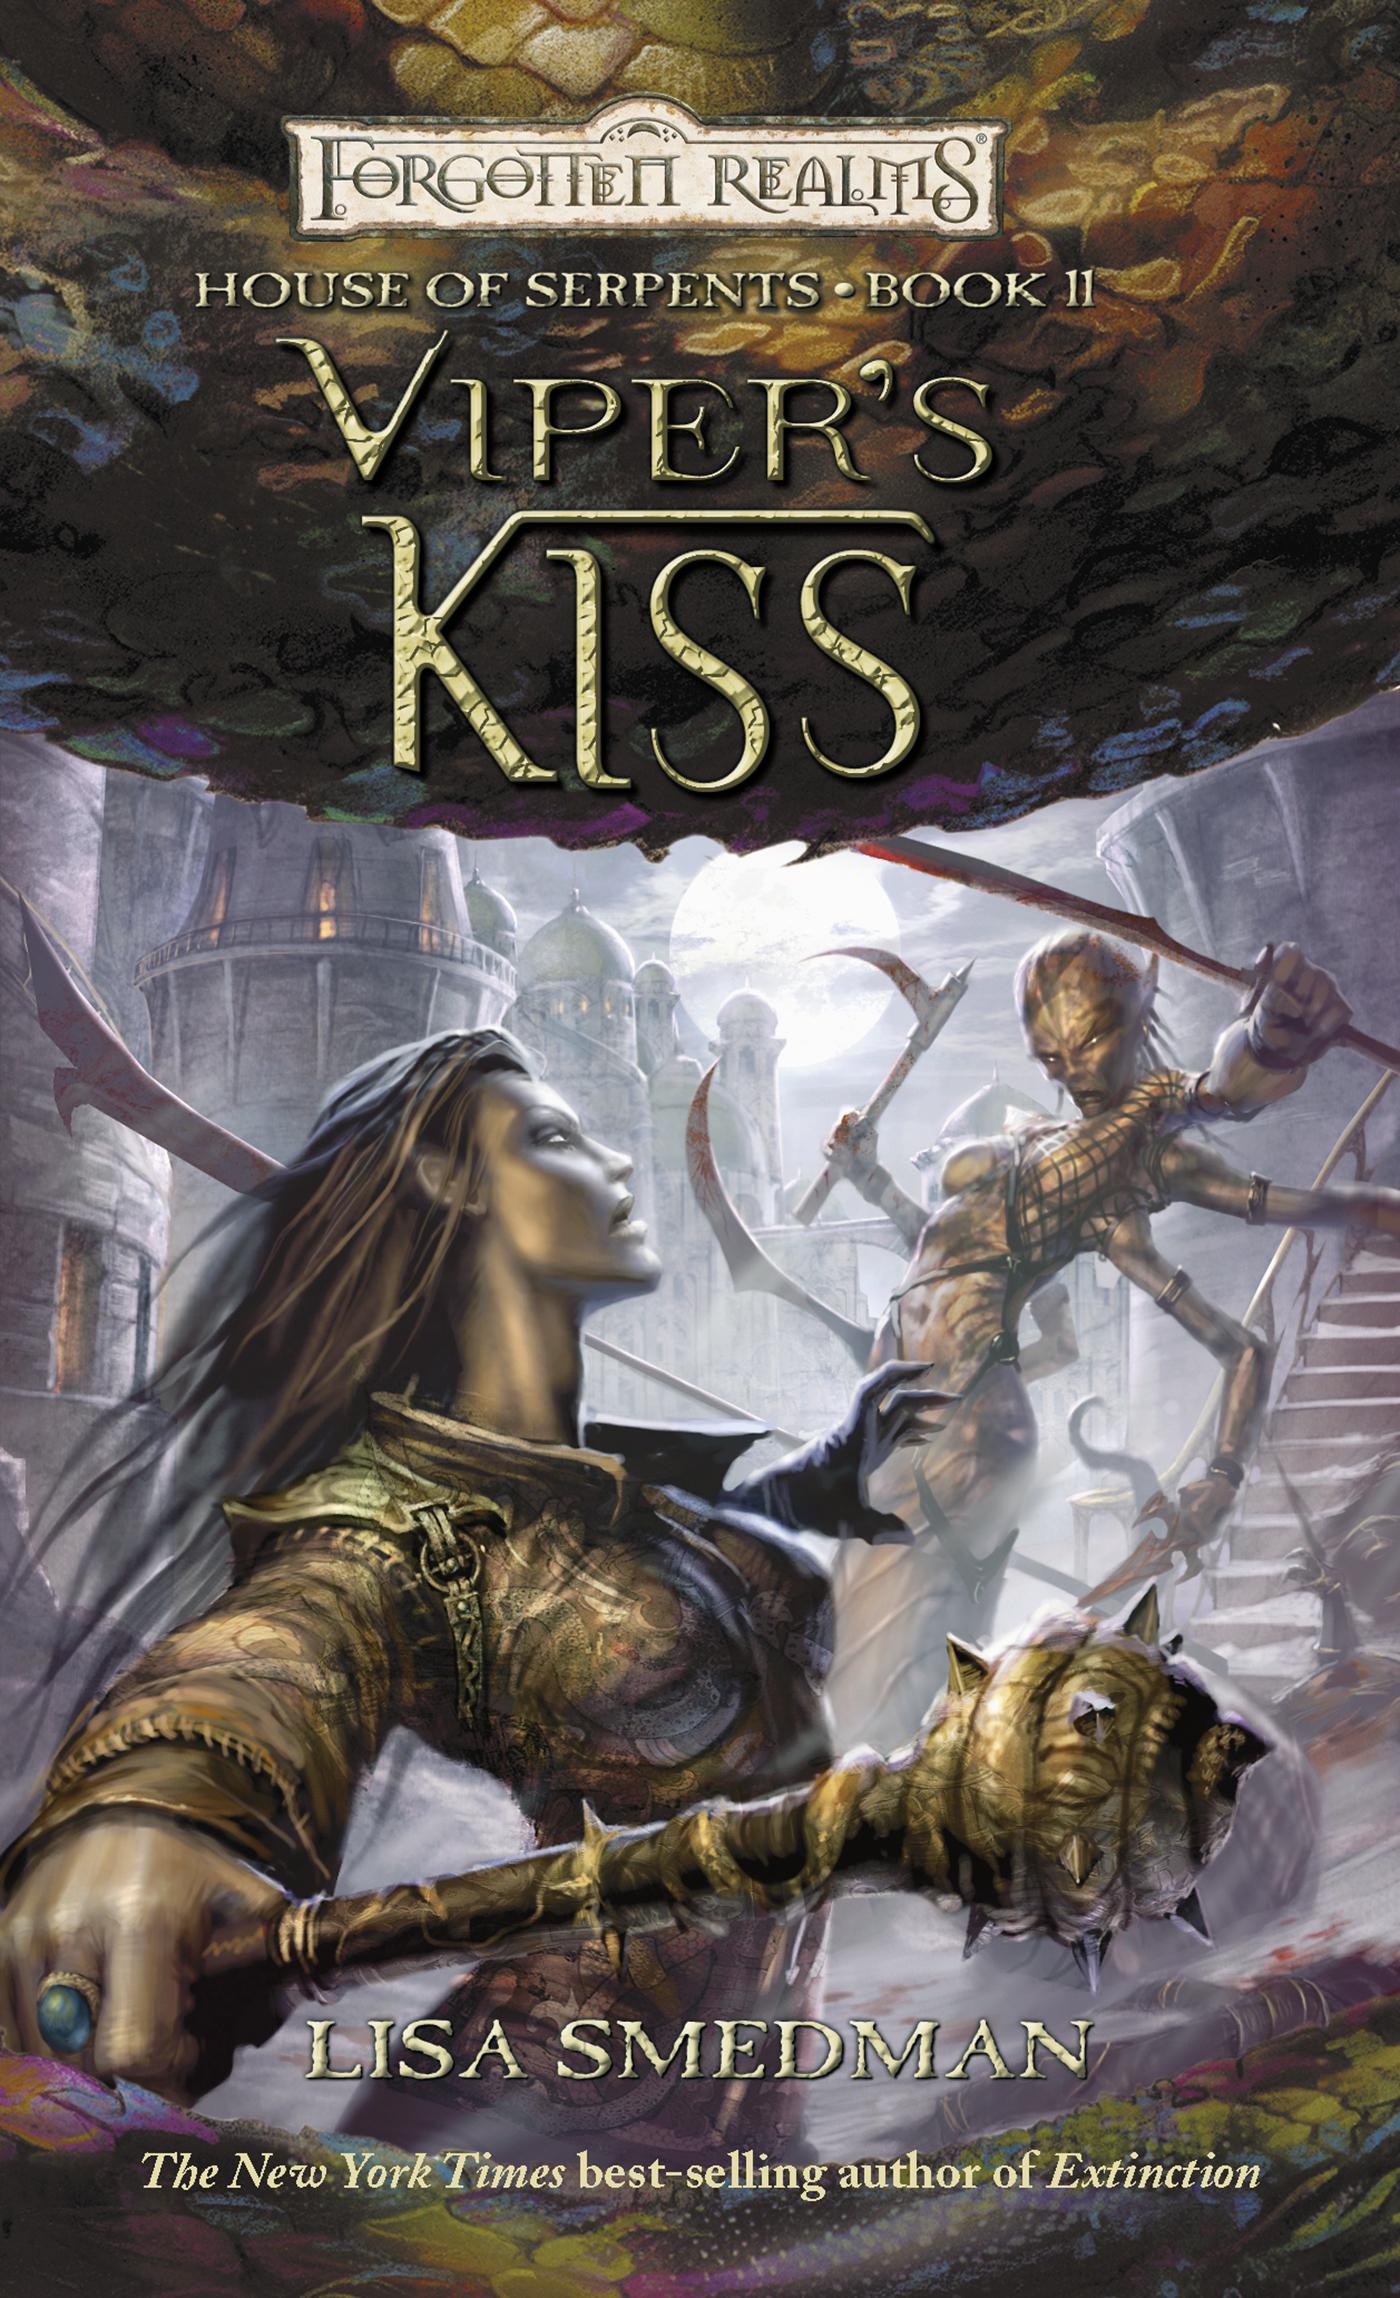 File:Viper's kiss.jpg